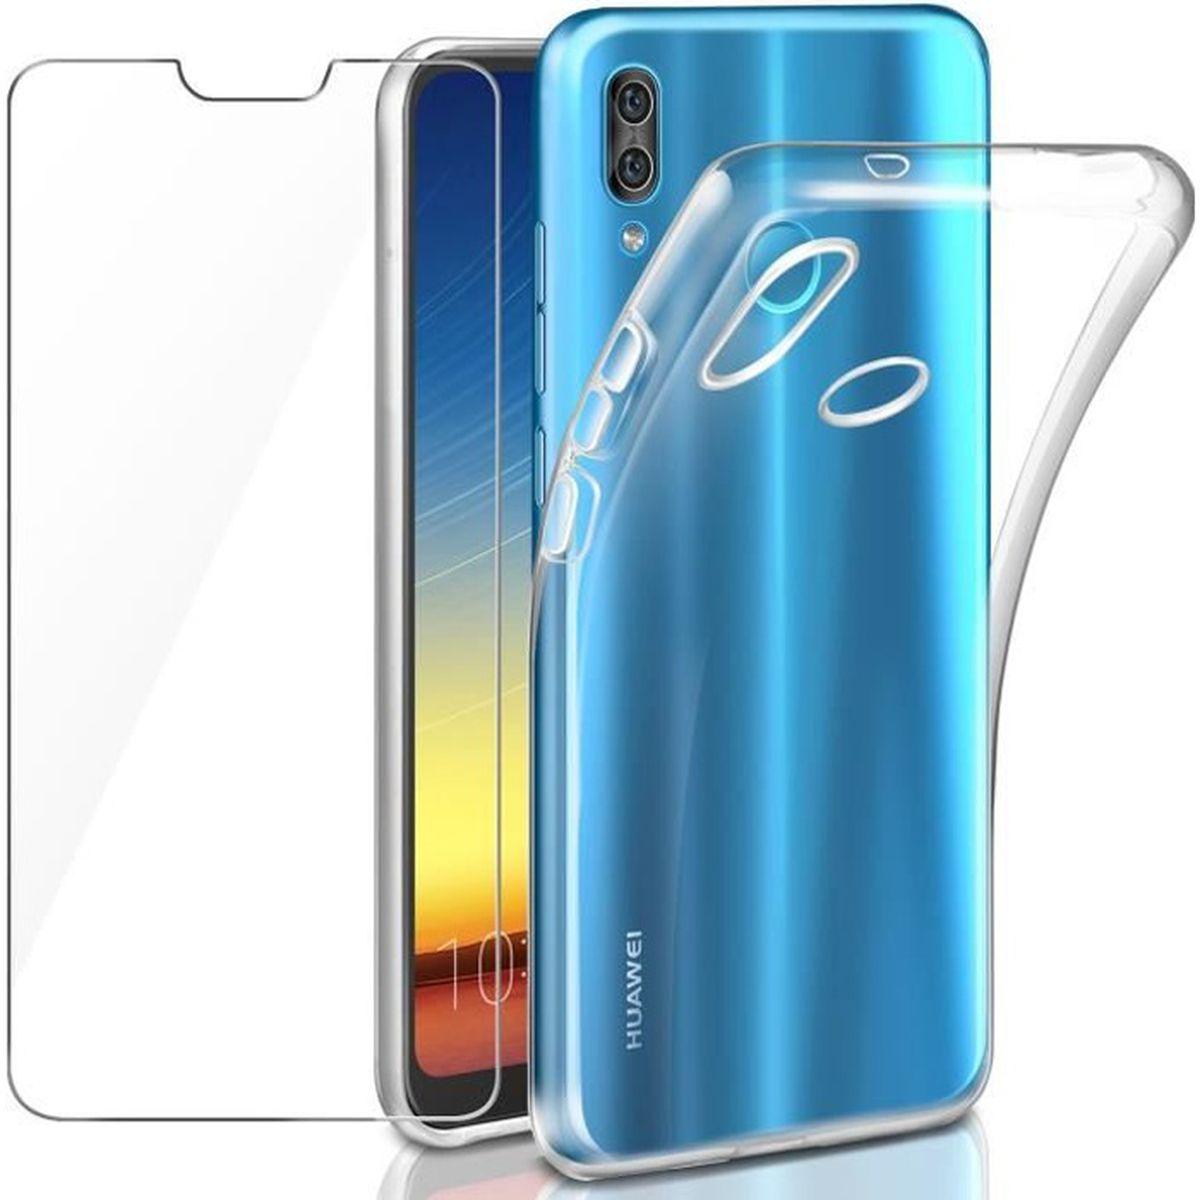 Coque Huawei P20 Lite Gel Silicone Transparente Verre trempé ...